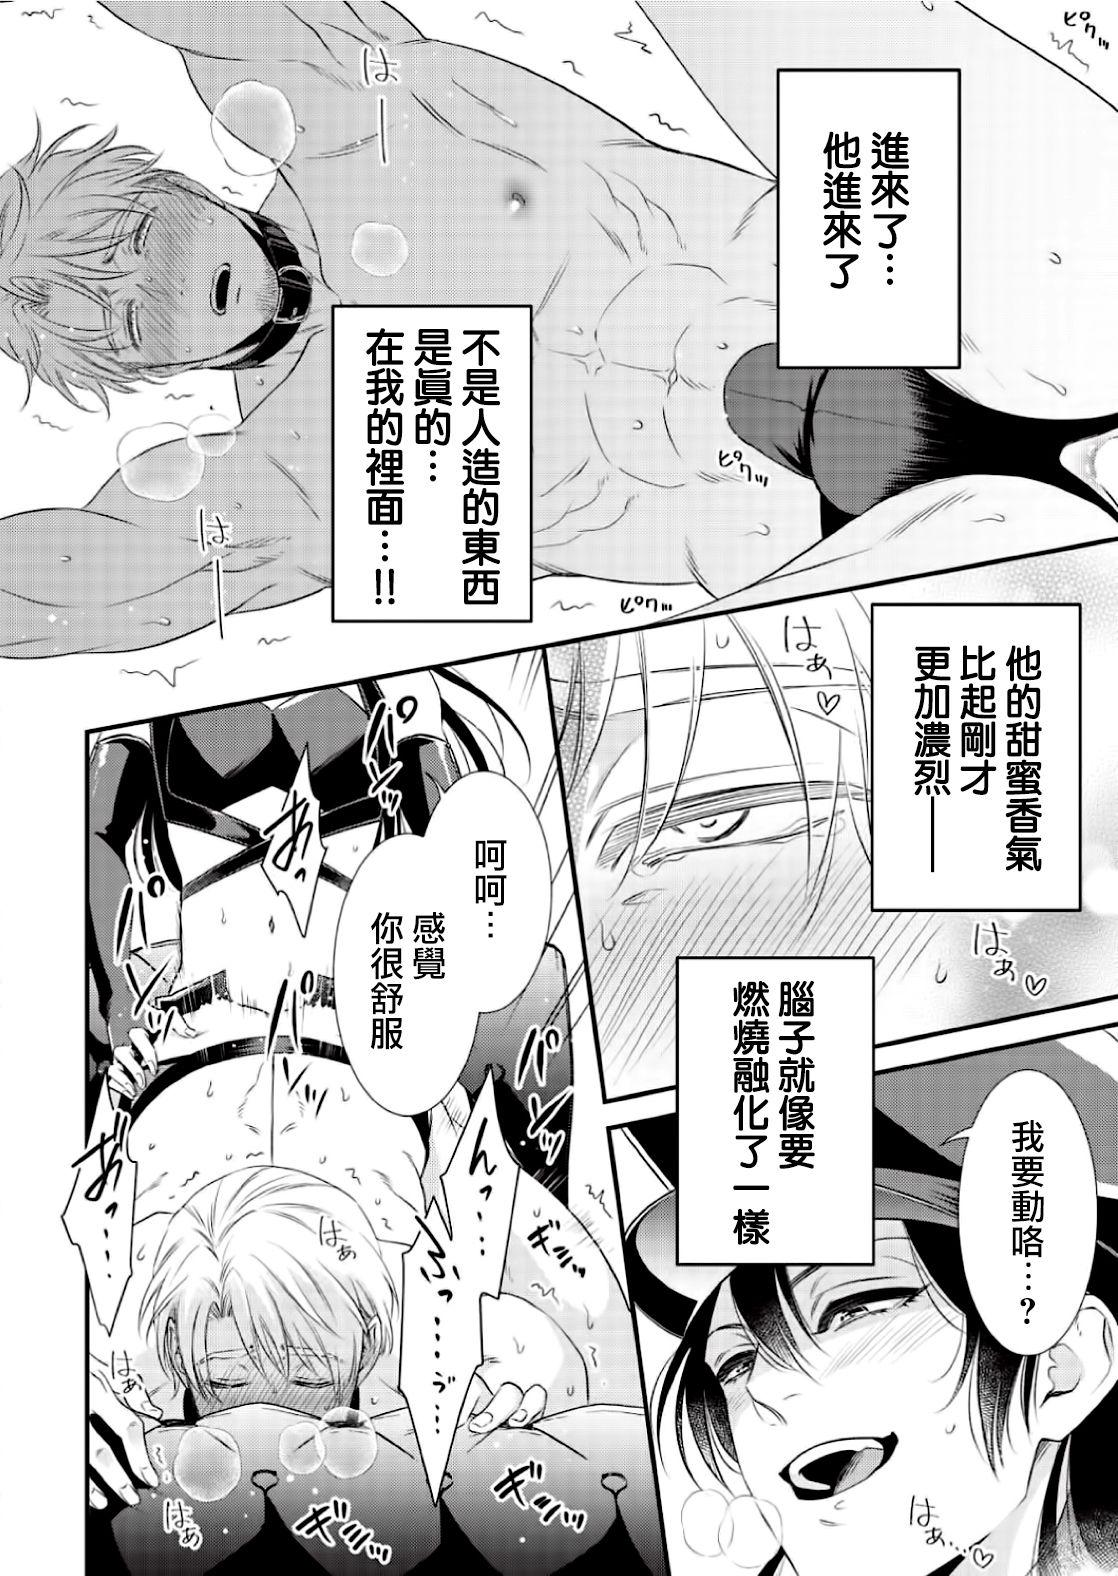 [Aion Kiu] Ijimete Kudasai Omega-sama ch.1-2 [Chinese] [沒有漢化] [Digital] 26